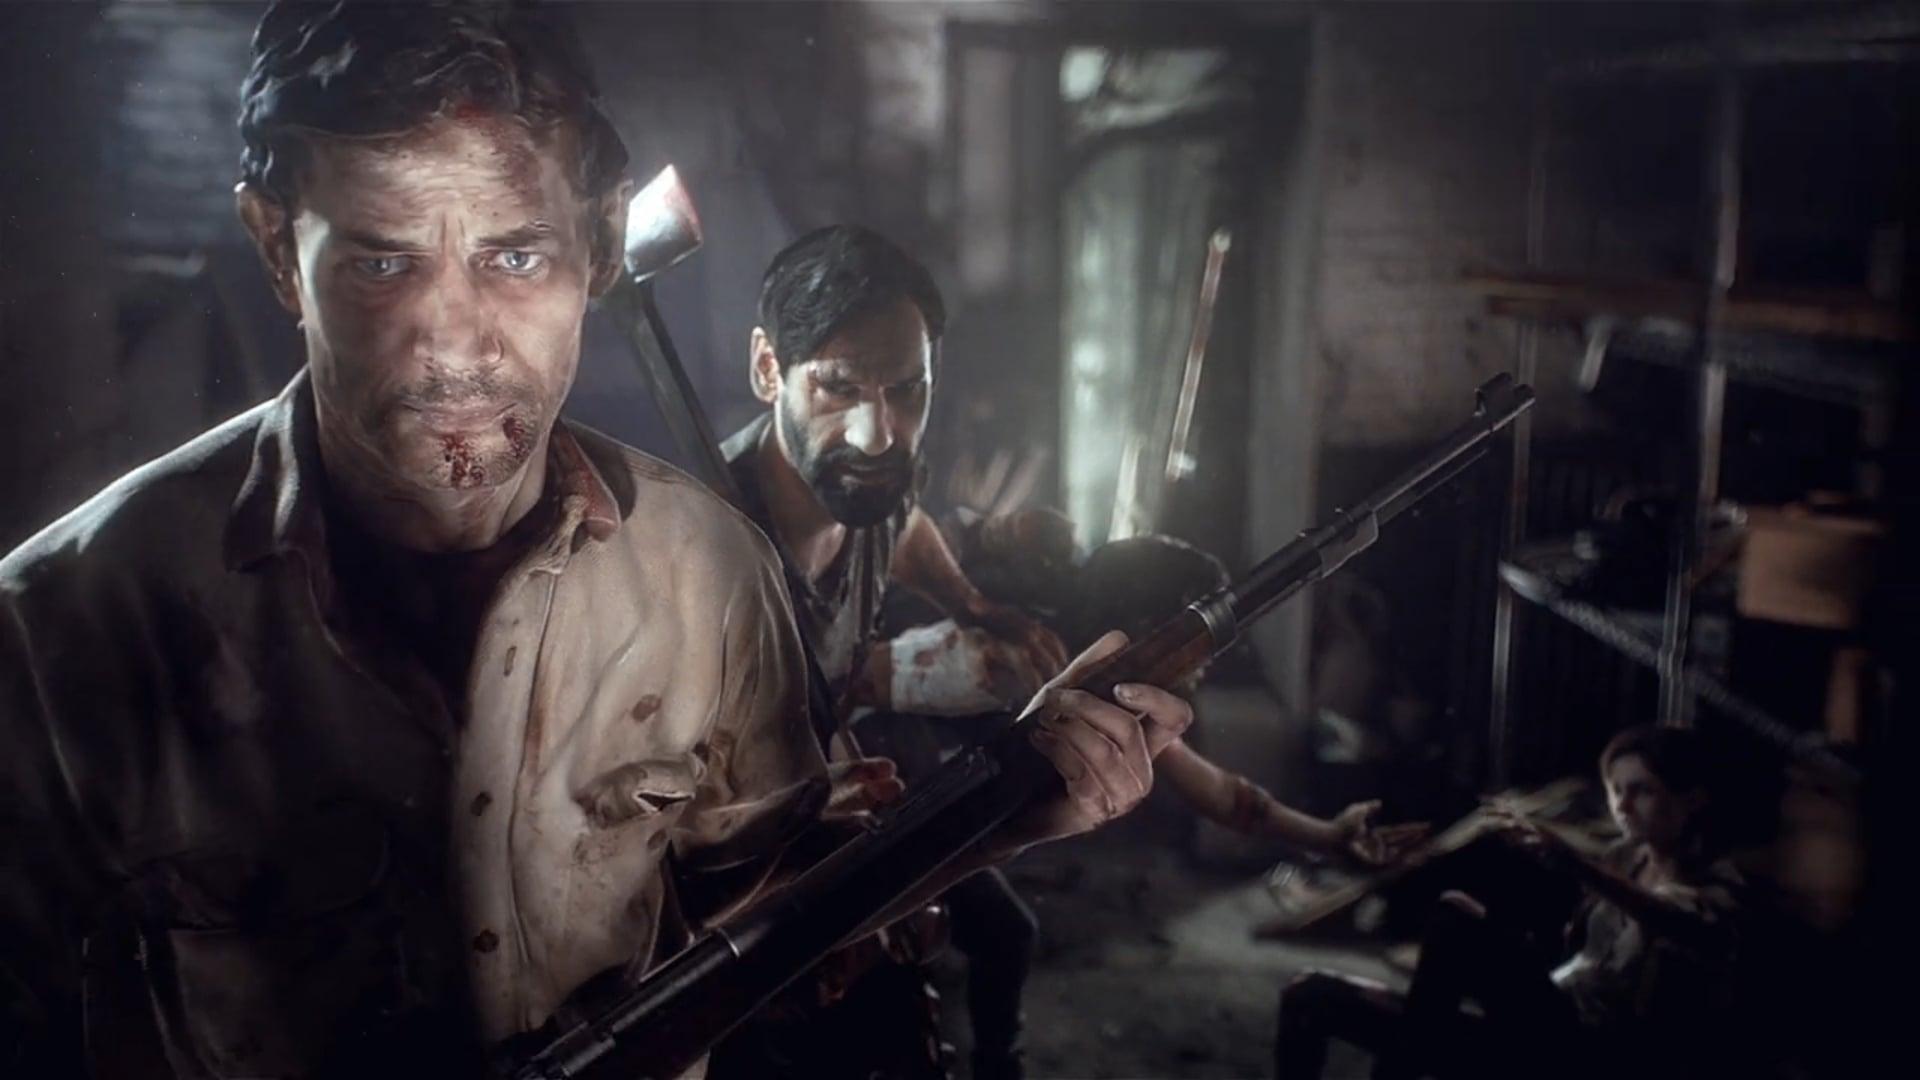 AMC The Walking Dead: No Man's Land Cinematic Trailer